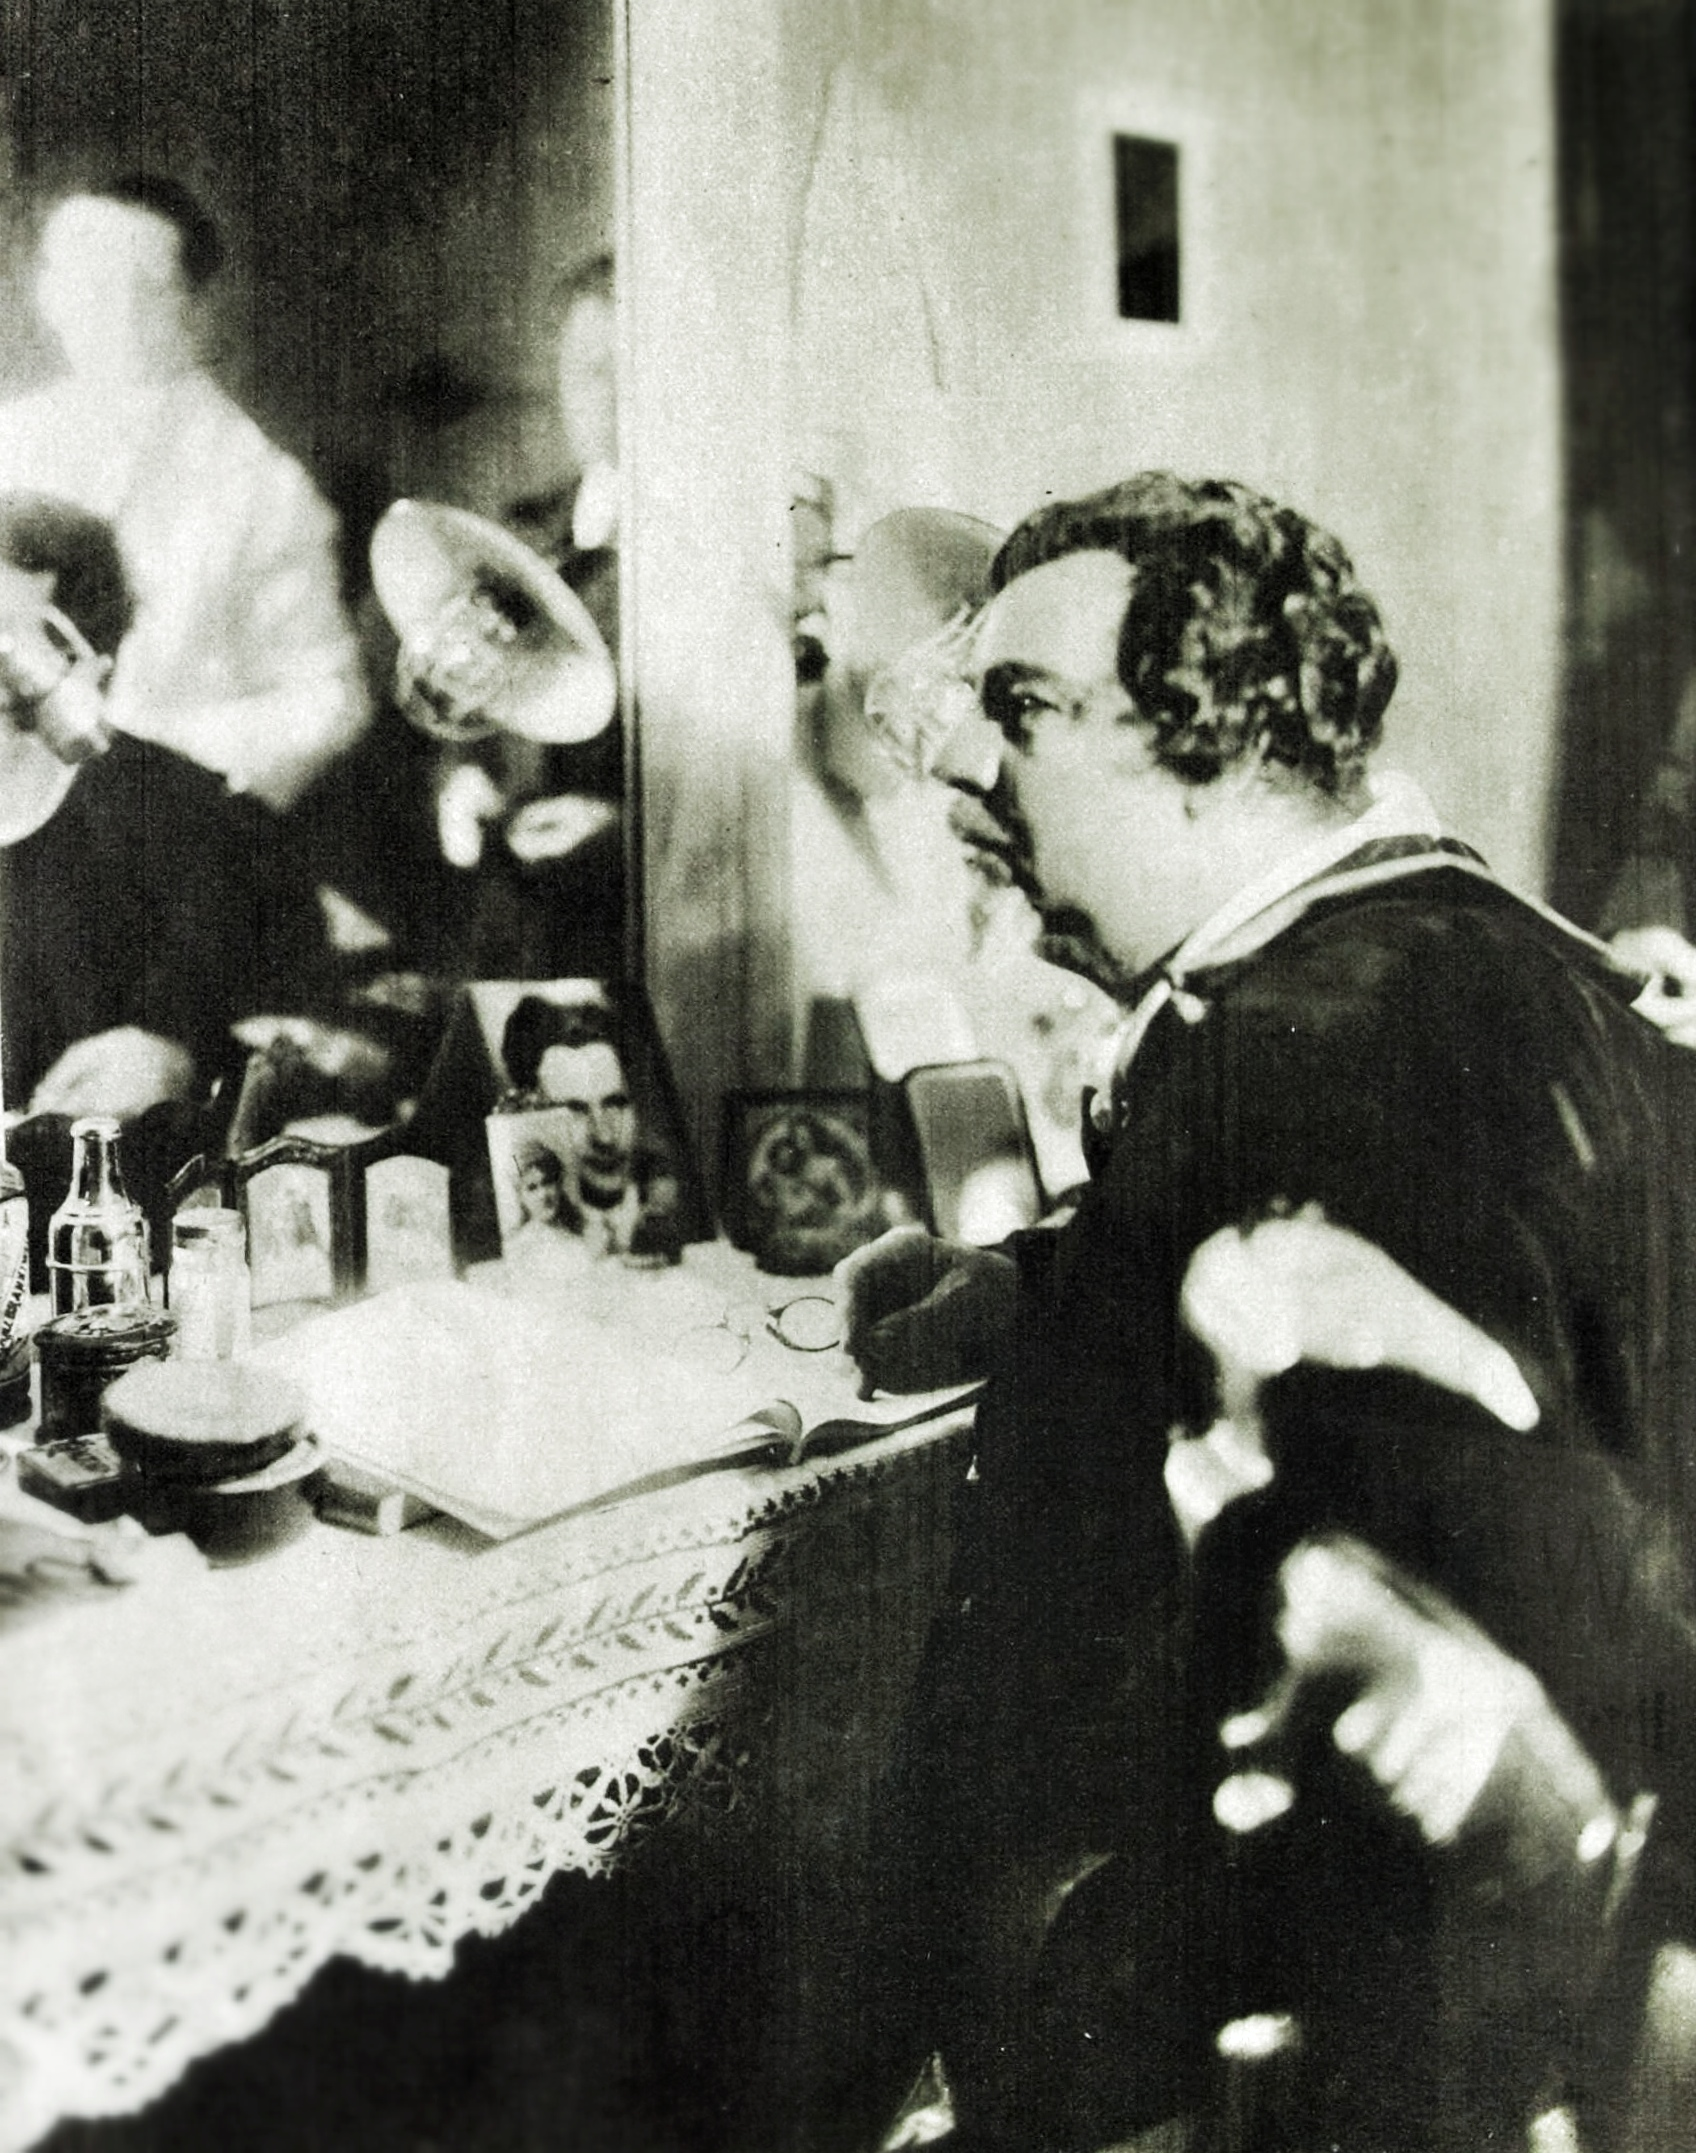 Aging opera superstar Leo Slezak as Blaubart in Berlin.